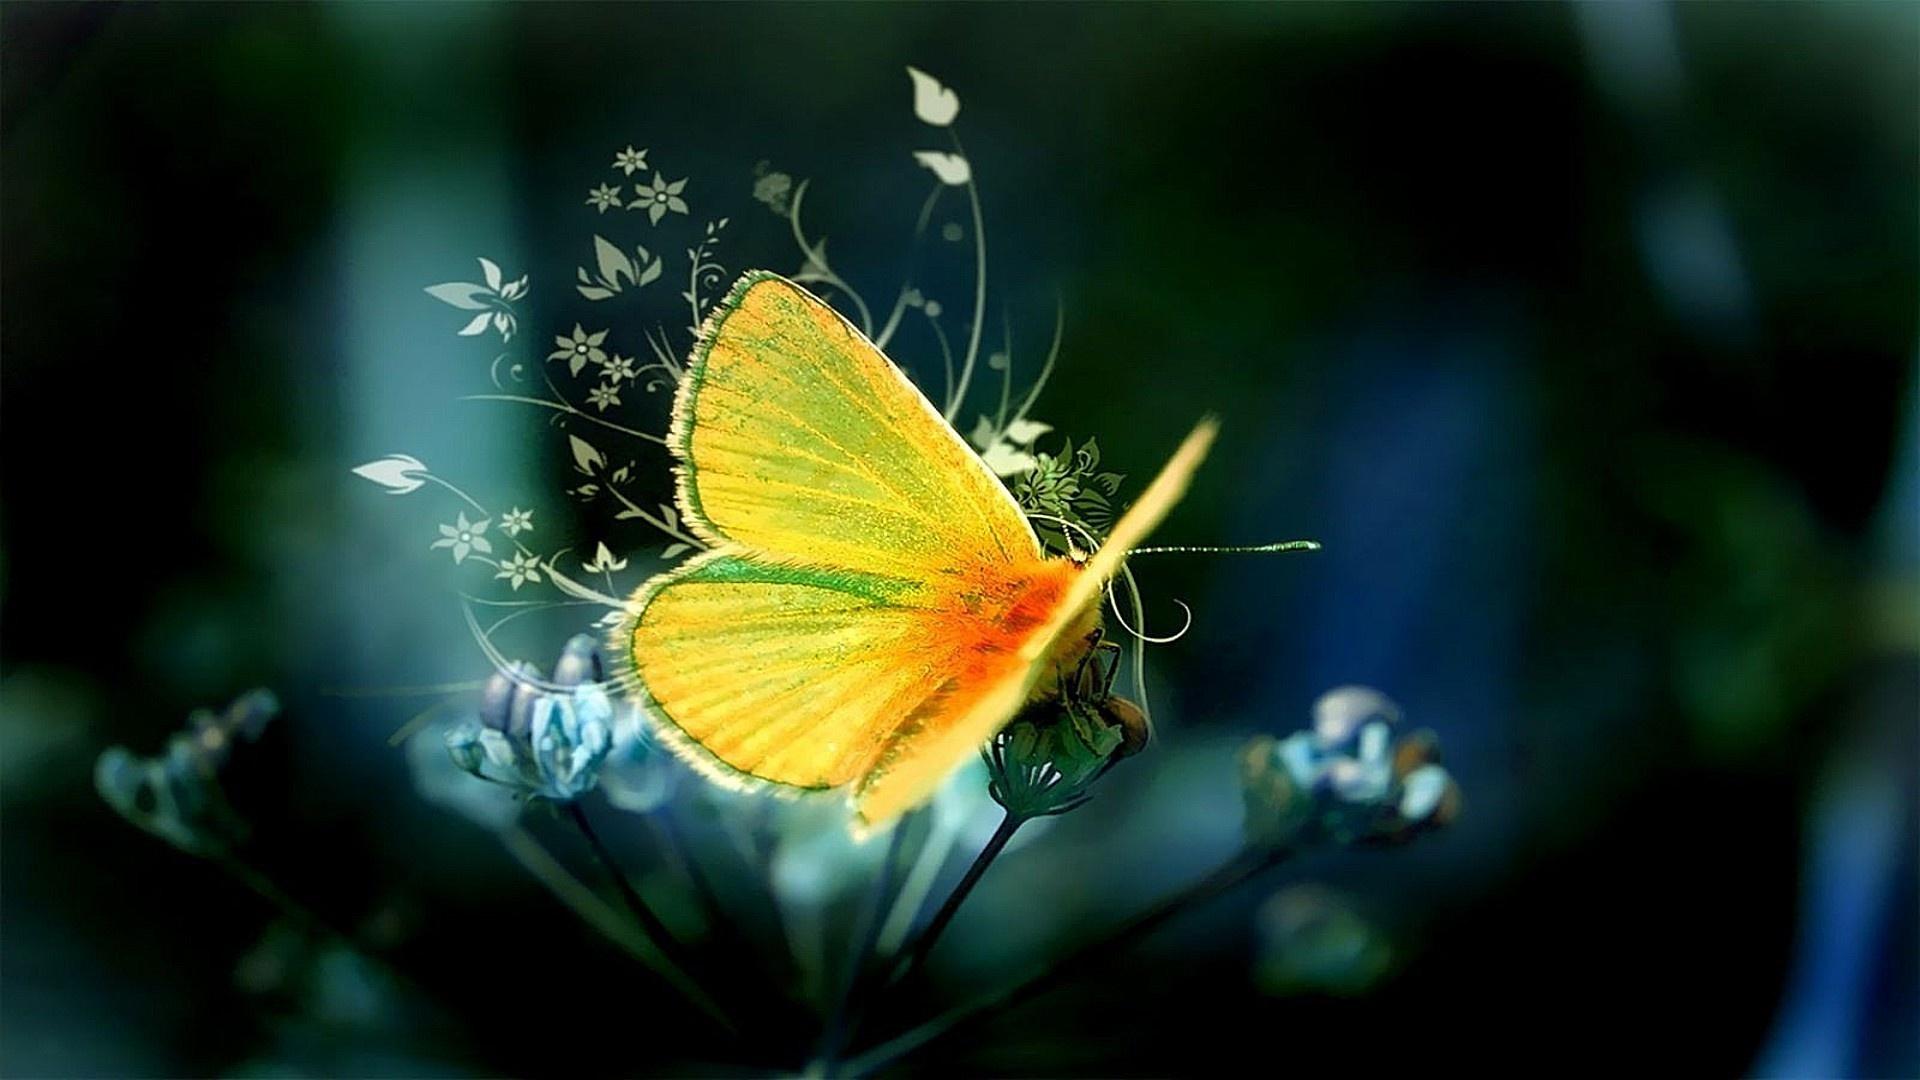 Butterfly 1080p wallpaper